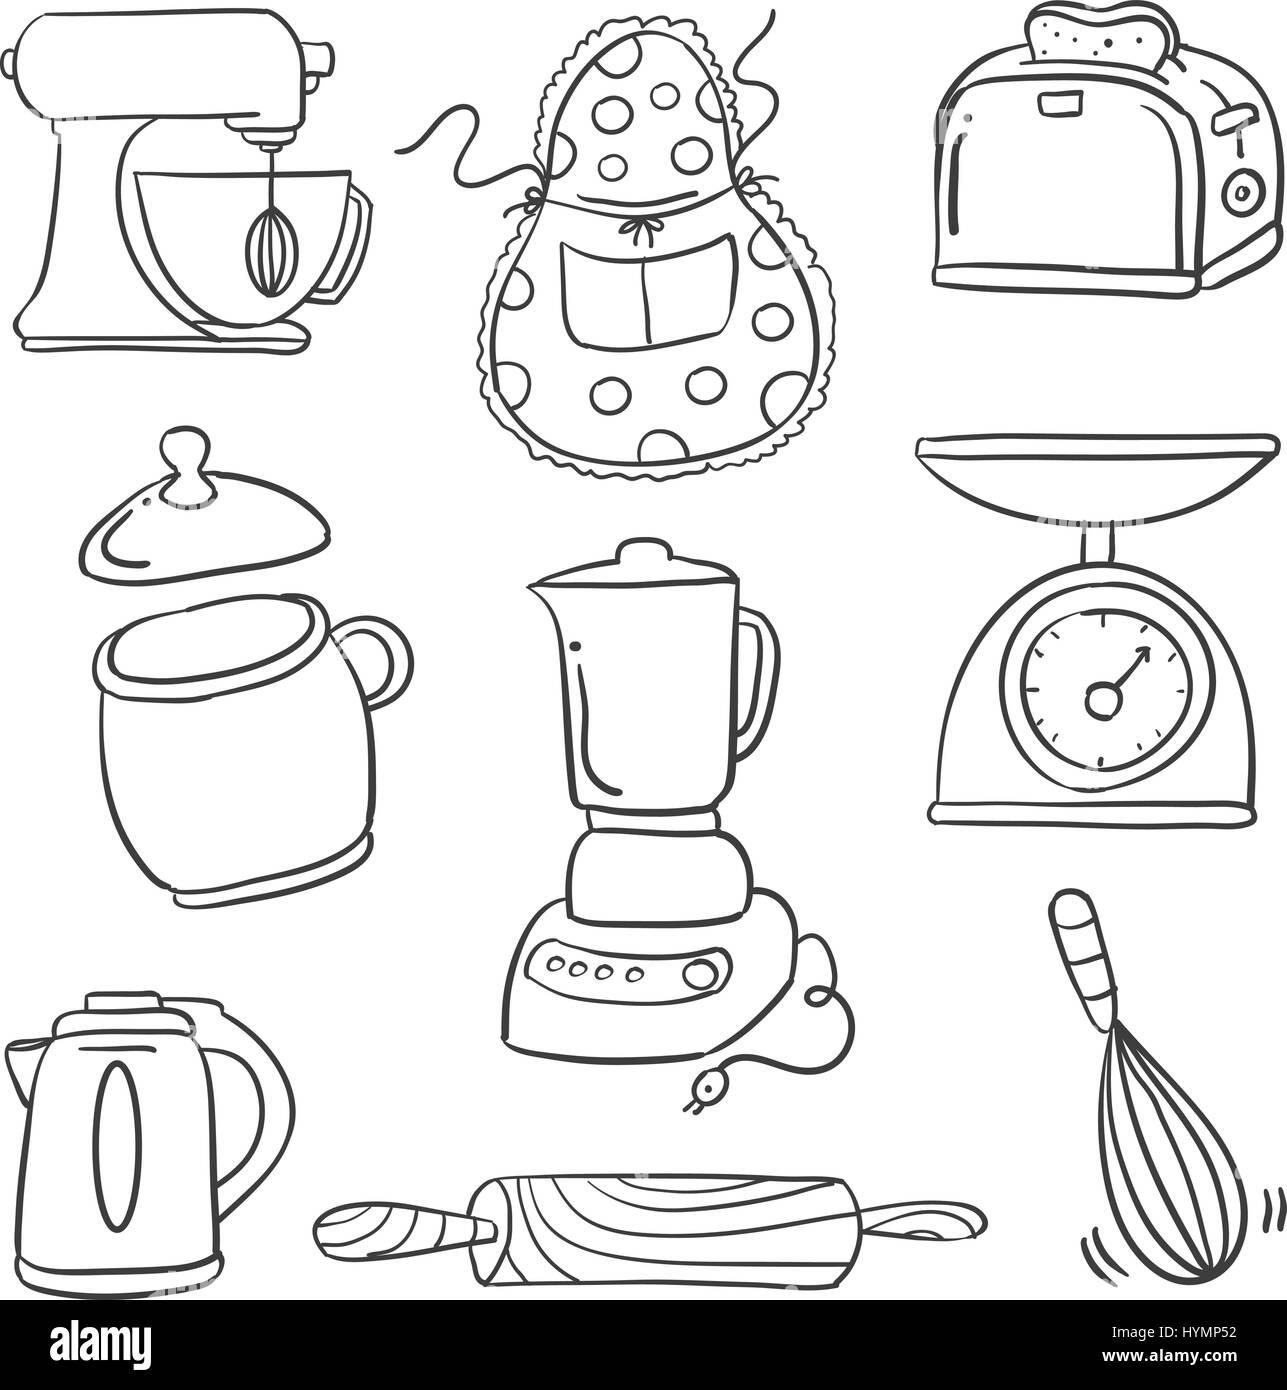 Kitchen Set Hand Draw Doodle Stock Photos Kitchen Set Hand Draw